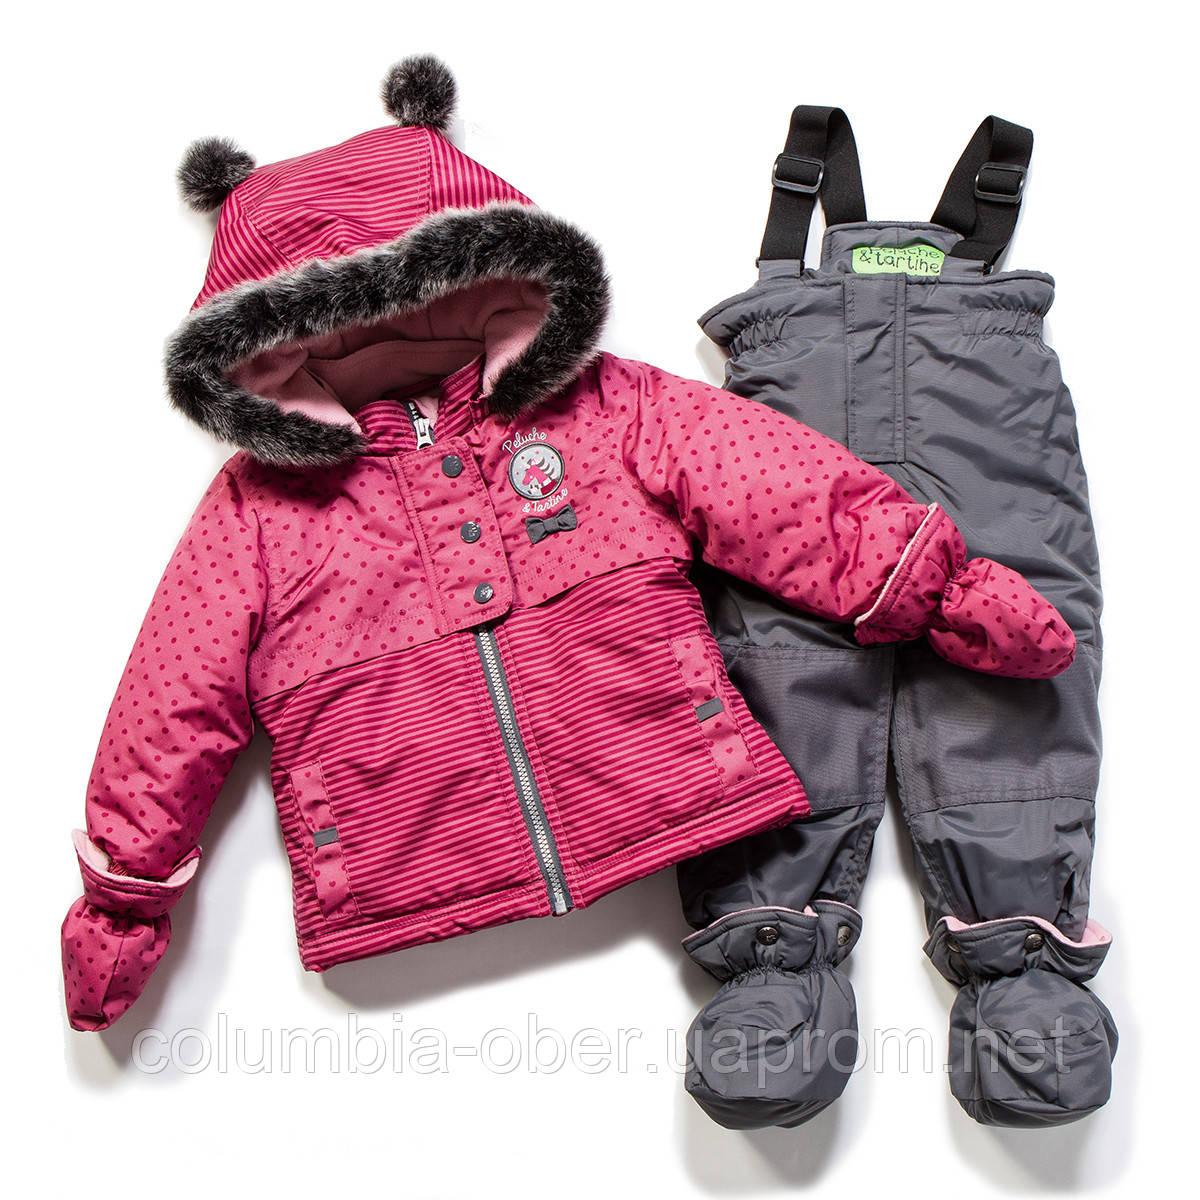 Зимний костюм для девочки PELUCHE F17 M 08 BF Secret Pink / Smoke. Размеры 75 - 97.